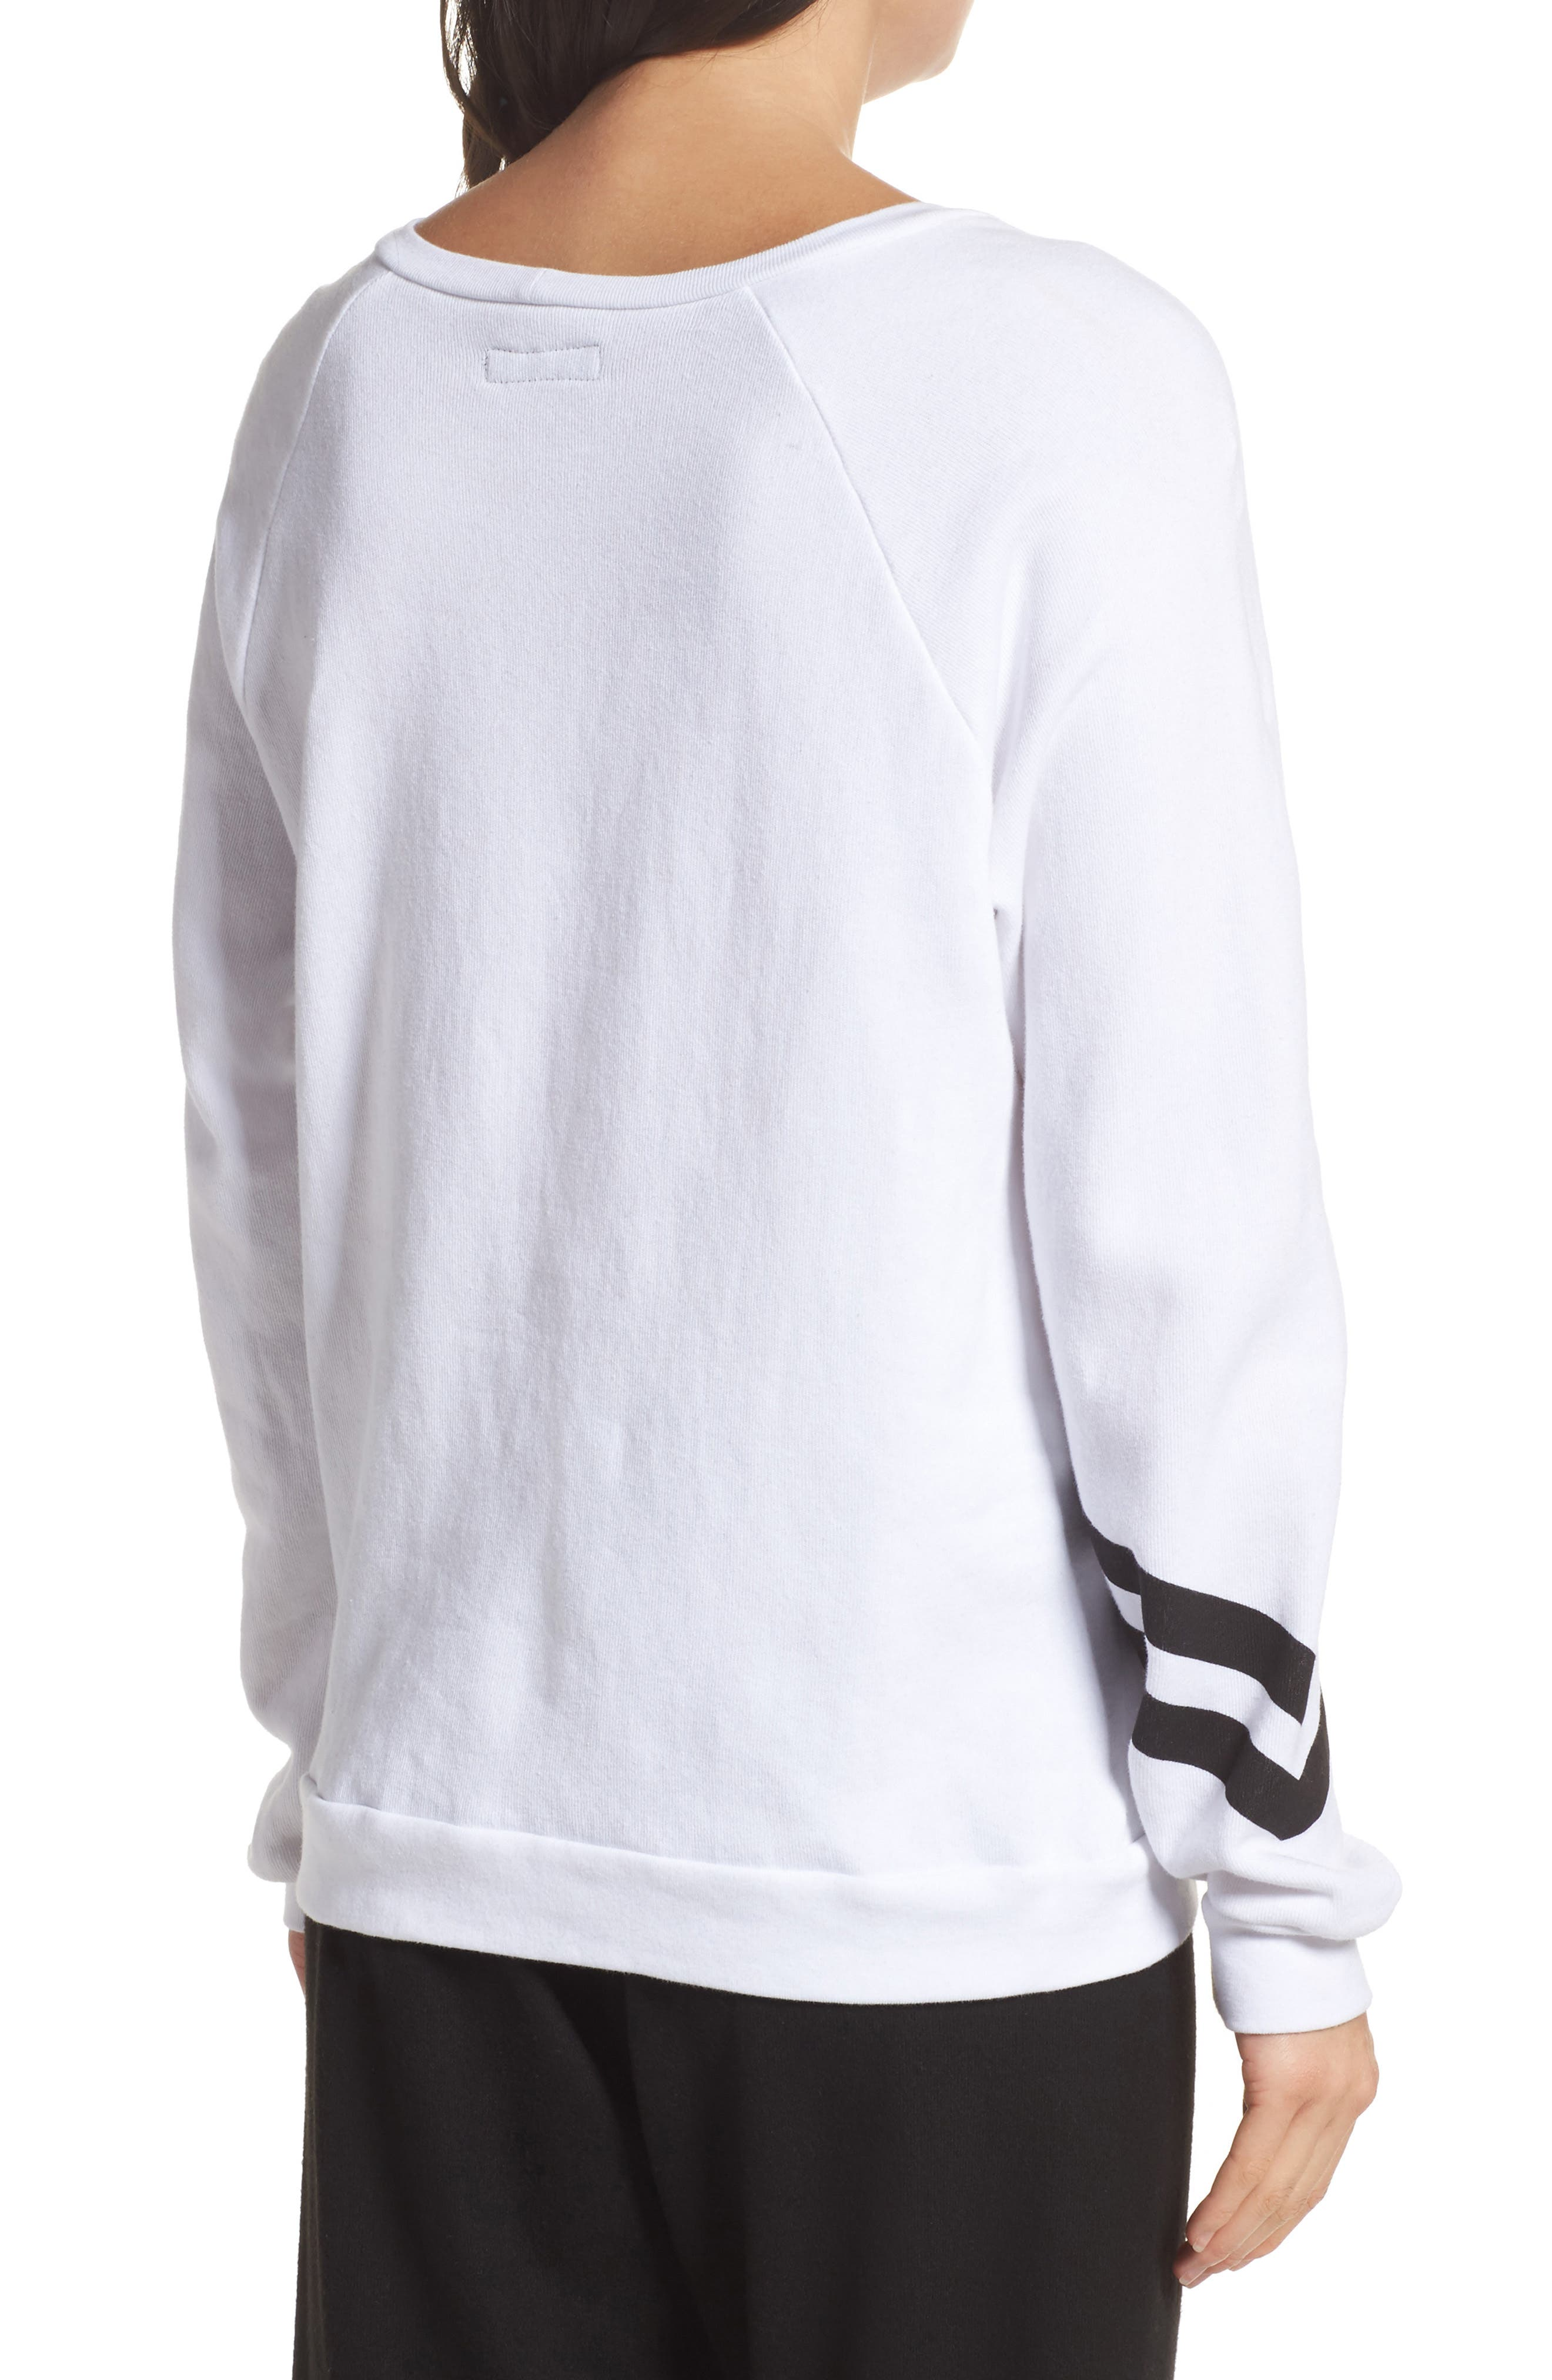 Oswald Vintage Sweatshirt,                             Alternate thumbnail 2, color,                             100